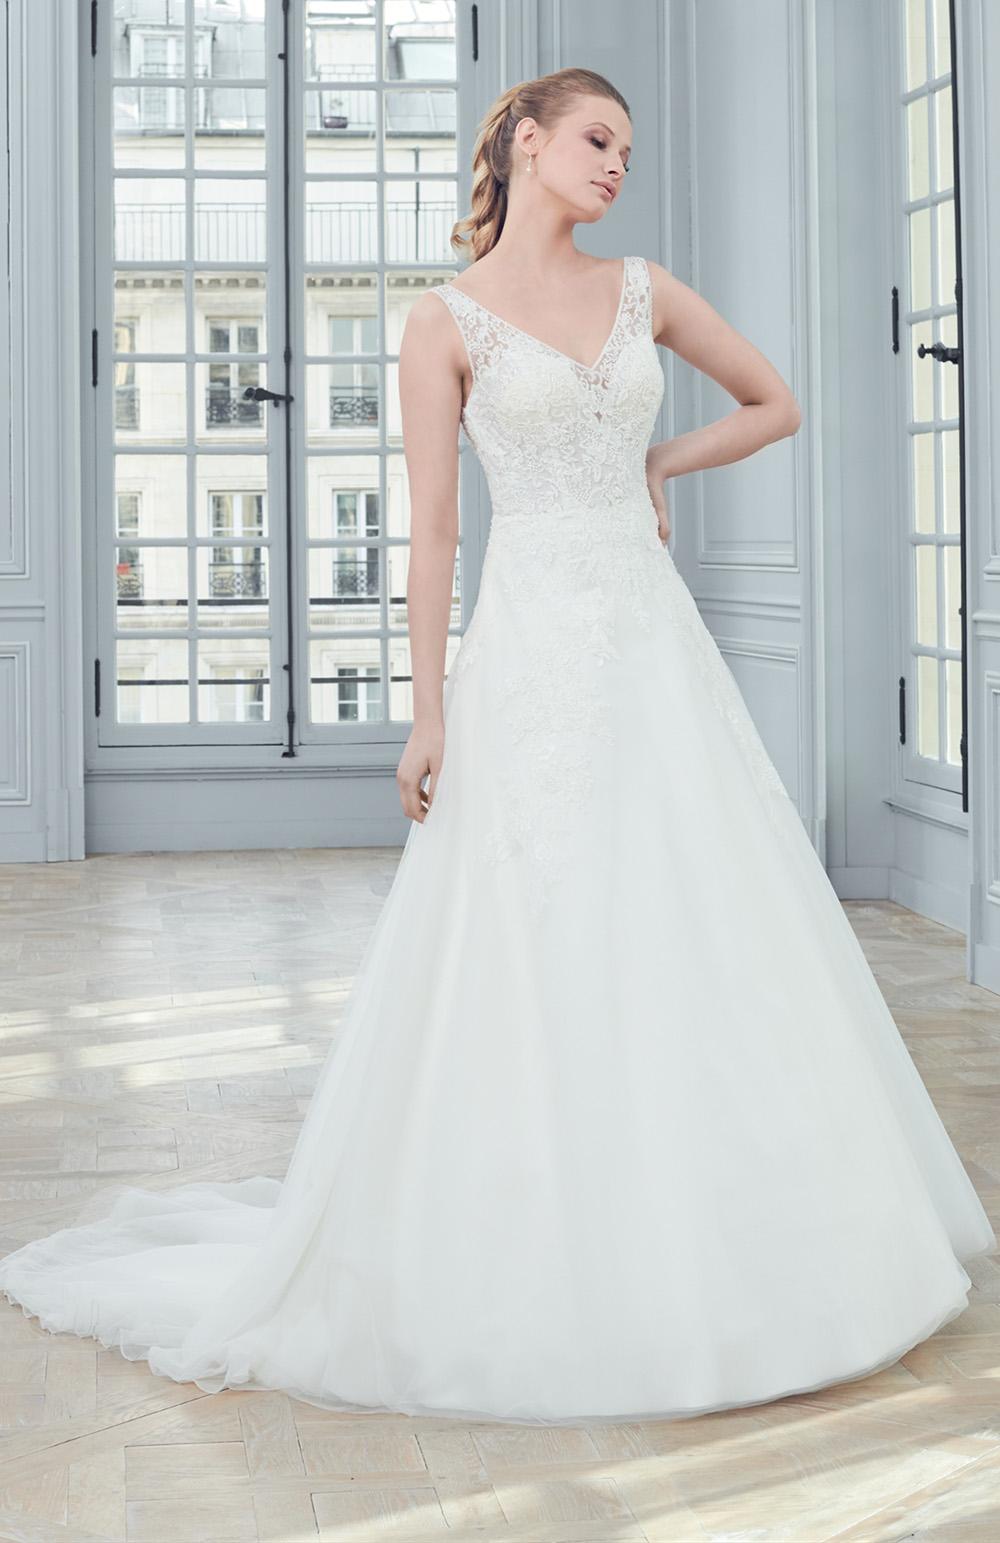 Robe de mariée Modèle Abby